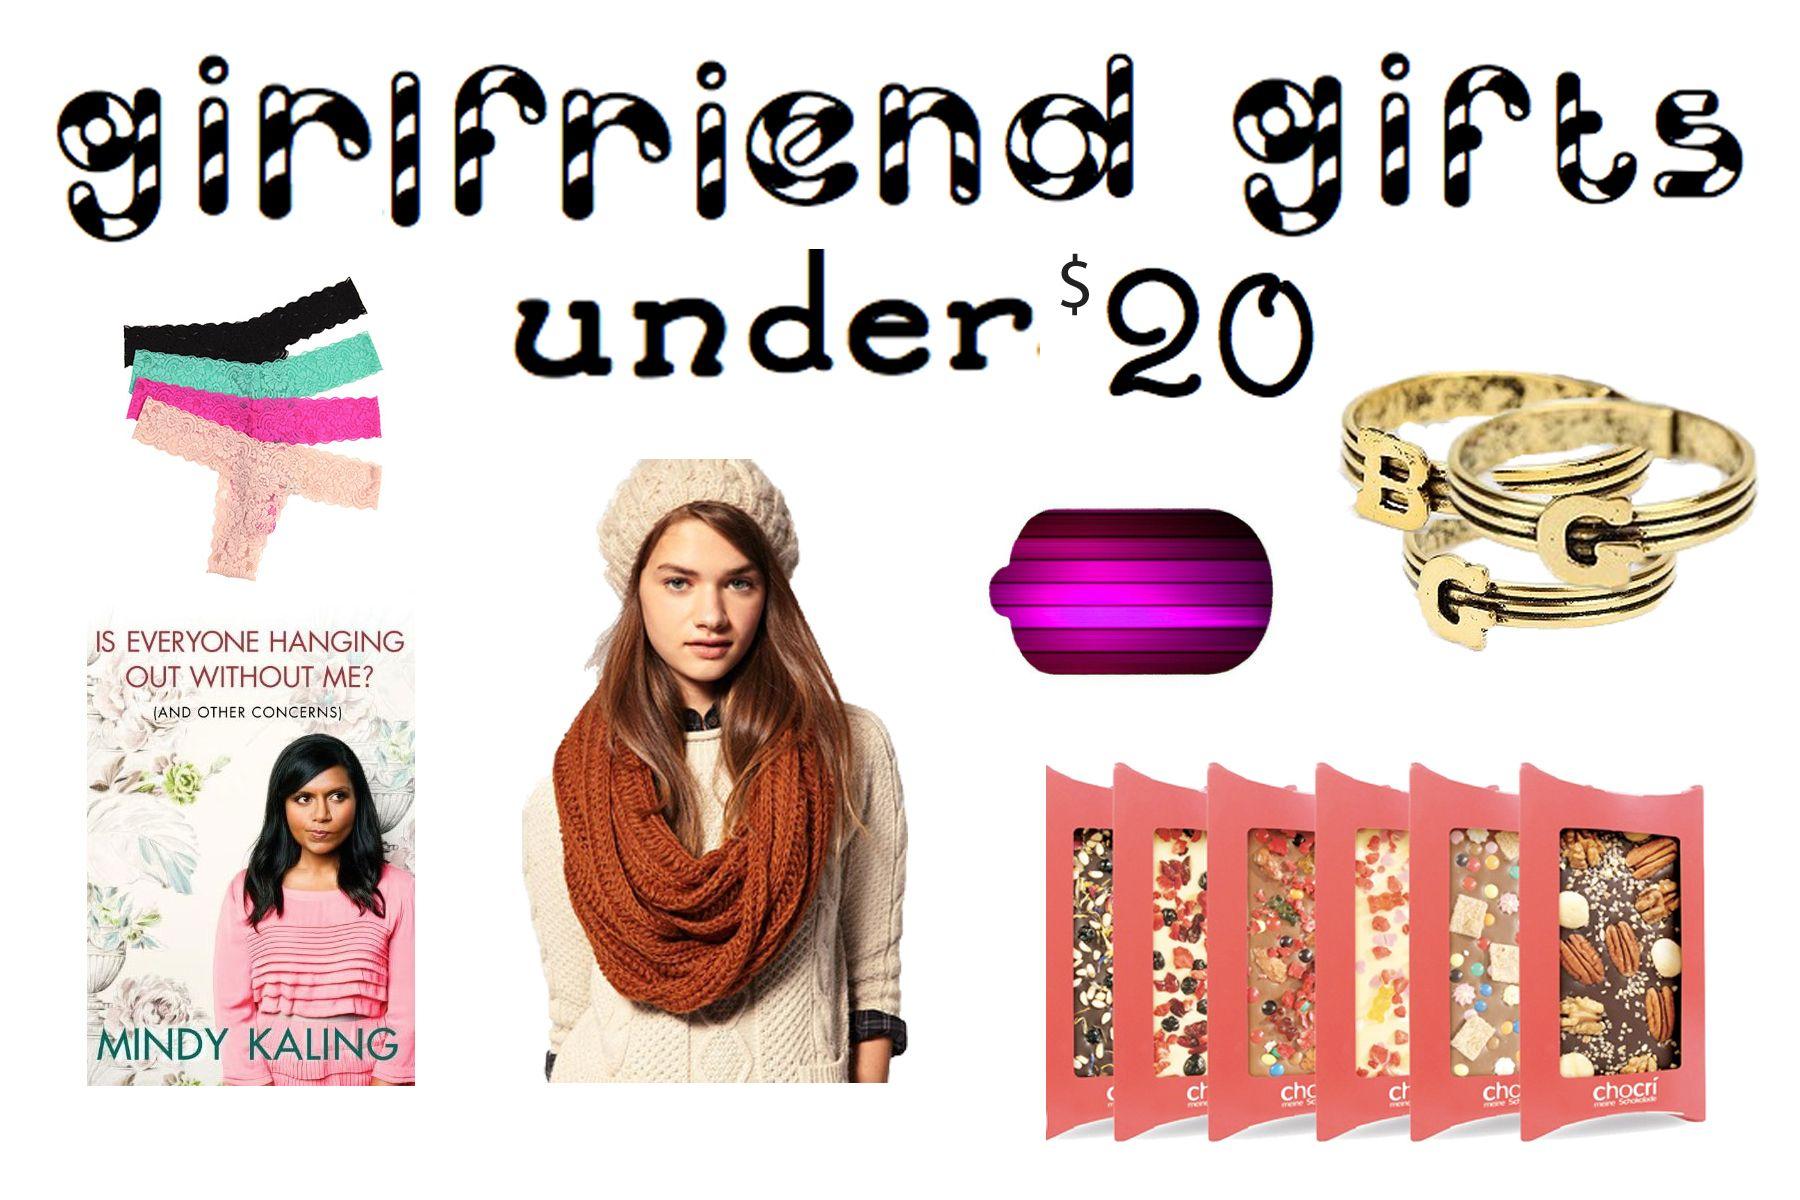 Birthday Gifts Ideas For Girlfriend Ebto Girlfriend Gifts Birthday Gifts Gifts